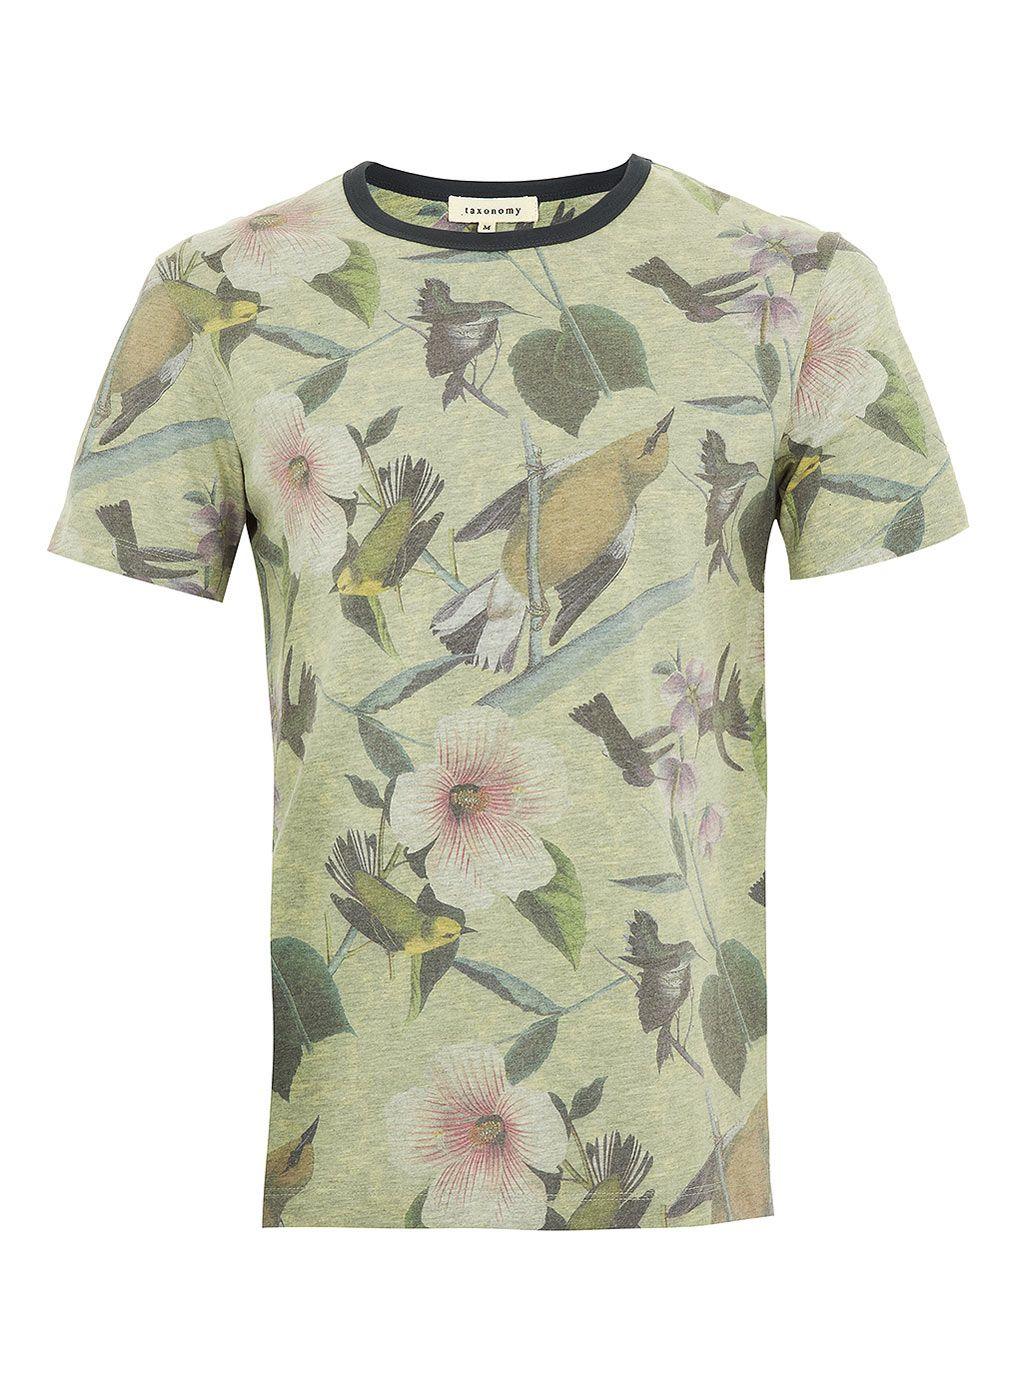 c838c4d69 TAXONOMY PRINTED T-SHIRT - Topman price: £28.00   TOPS   Fashion ...